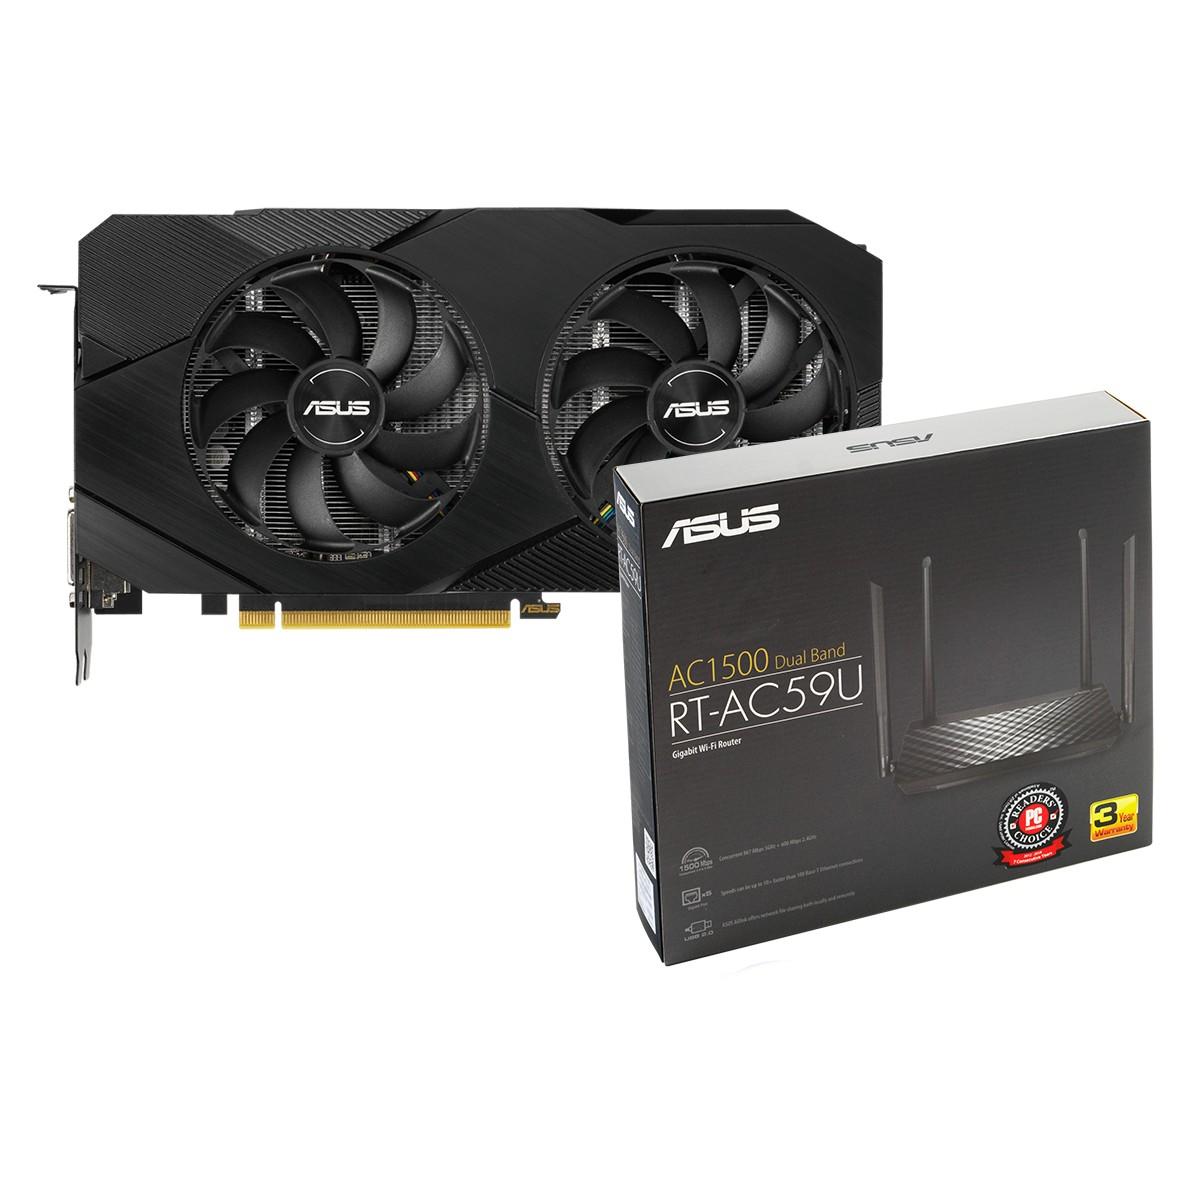 Kit Upgrade ASUS GeForce RTX 2060 OC EVO Dual + ASUS RT-AC59U